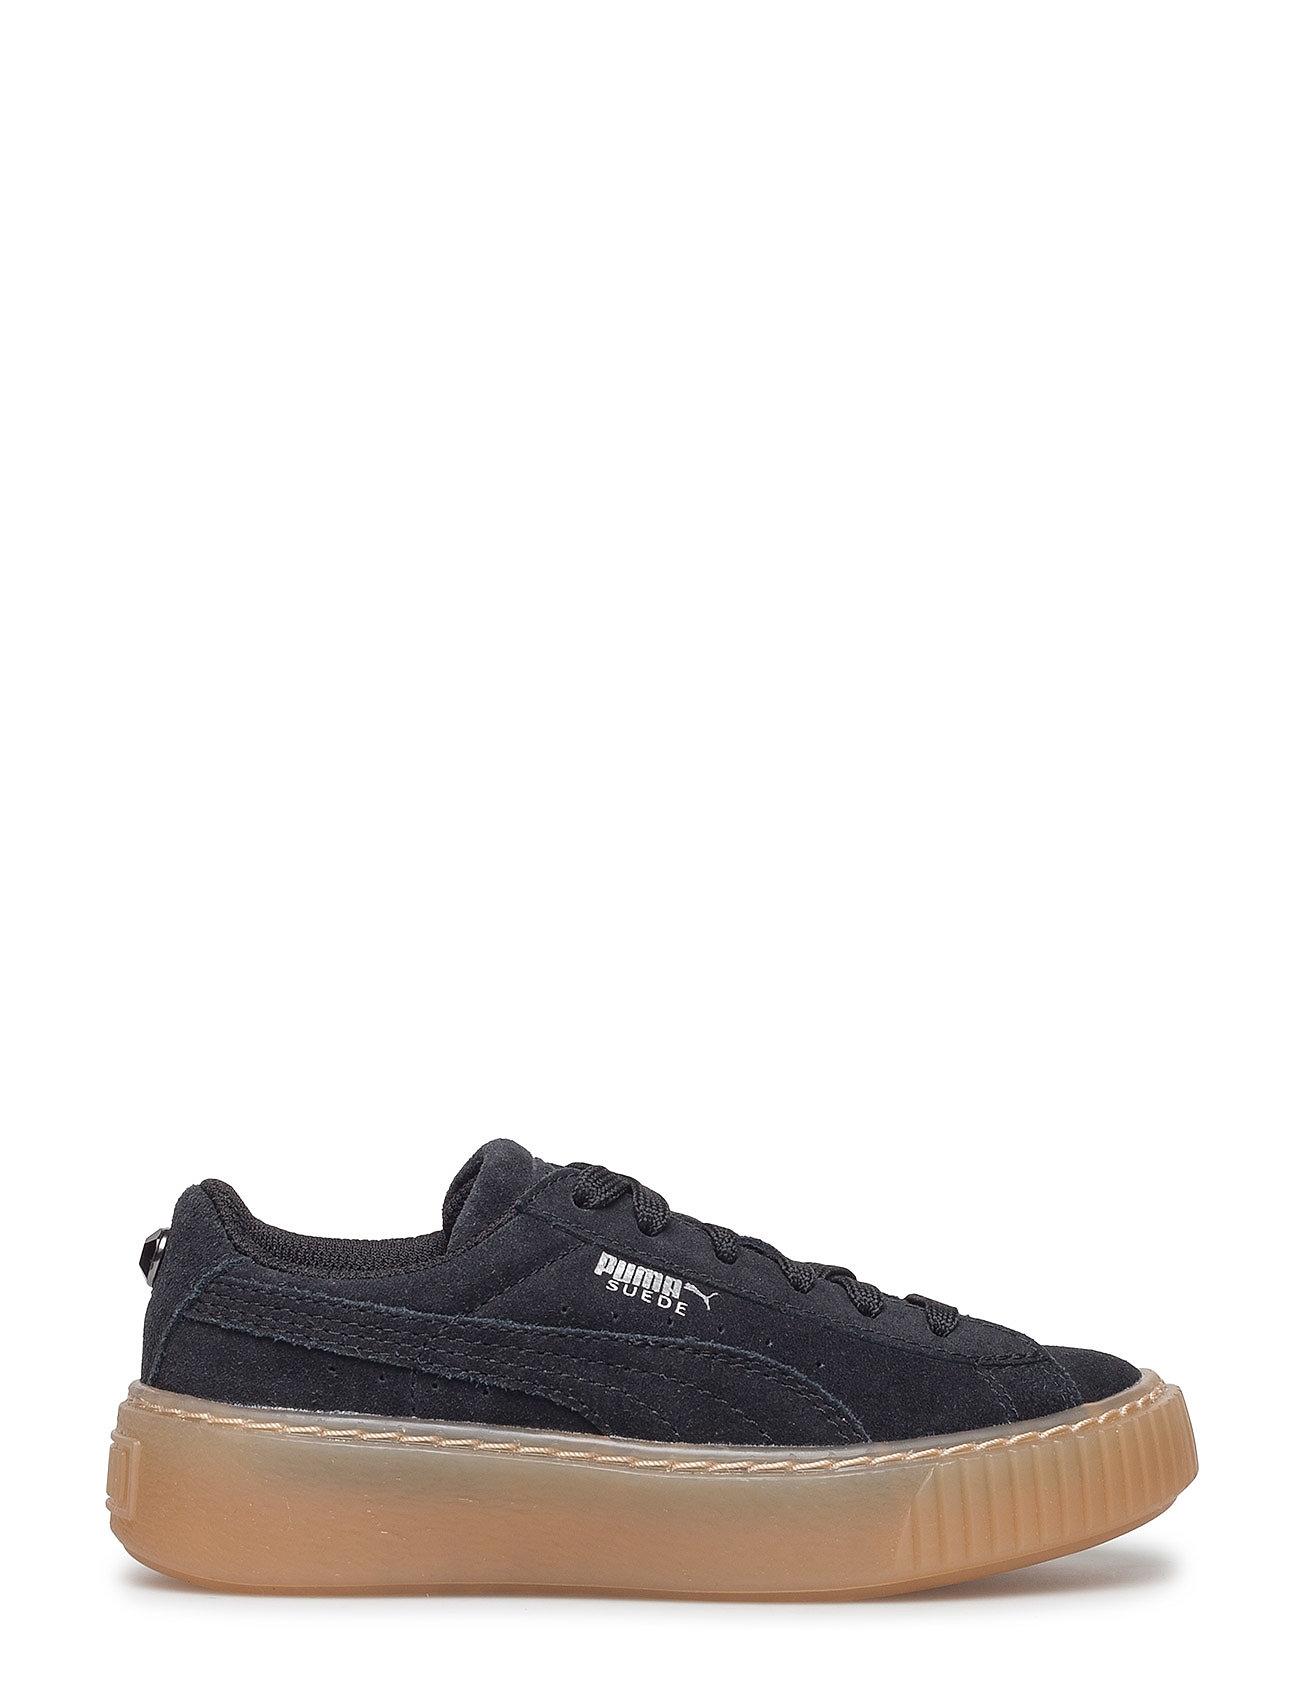 Suede Platform Jewel Ps Sneakers Sko Sort PUMA